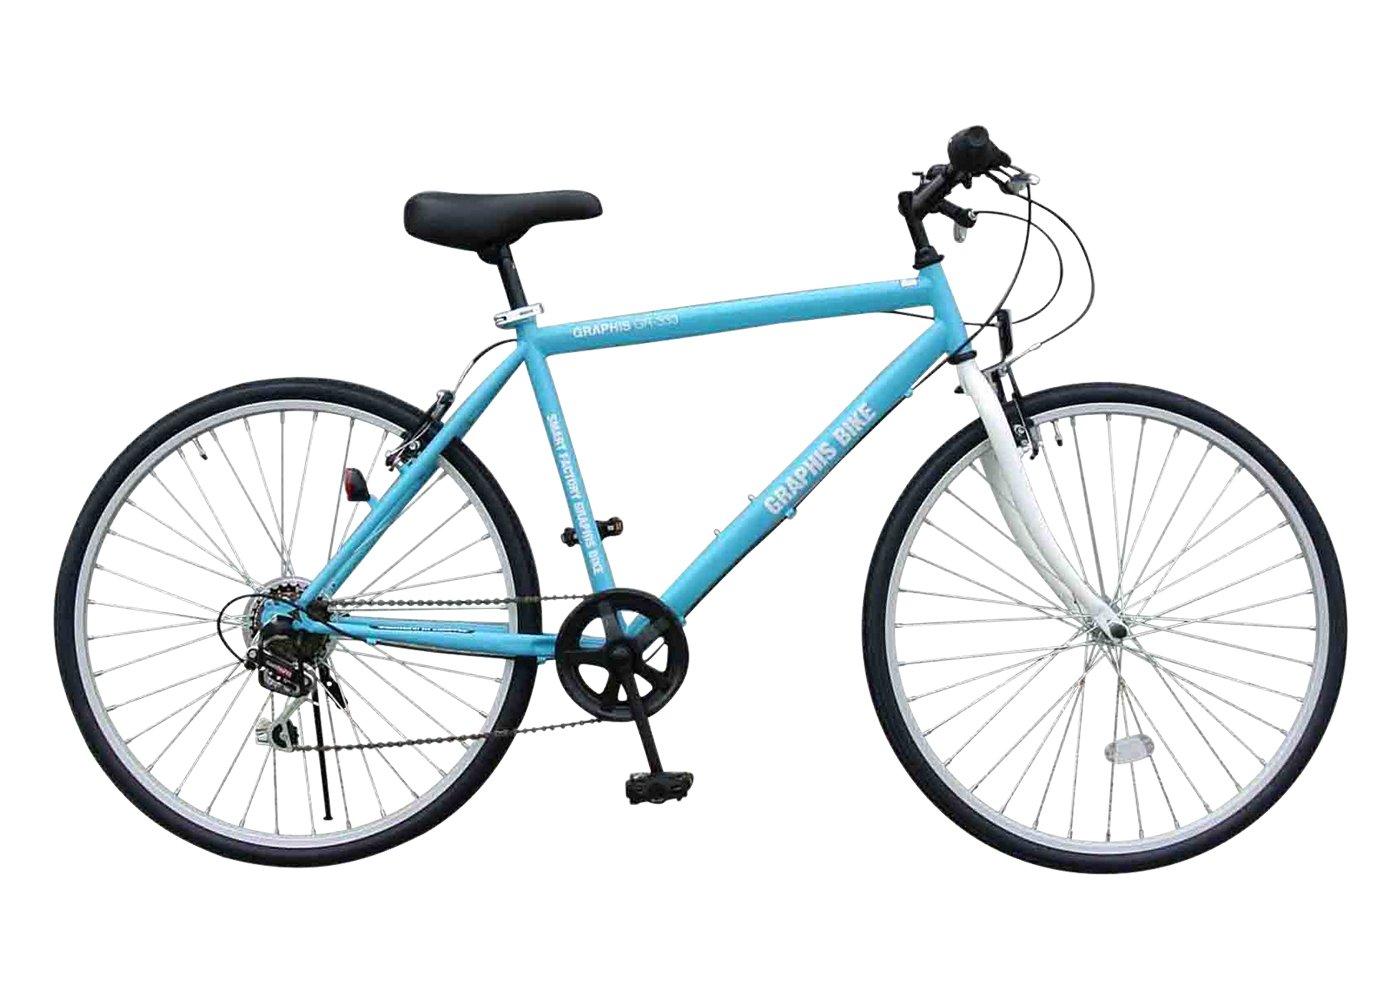 GRAPHIS(グラフィス) クロスバイク 26インチ 6段変速 GR-333 B00HVTJ7Y8水色